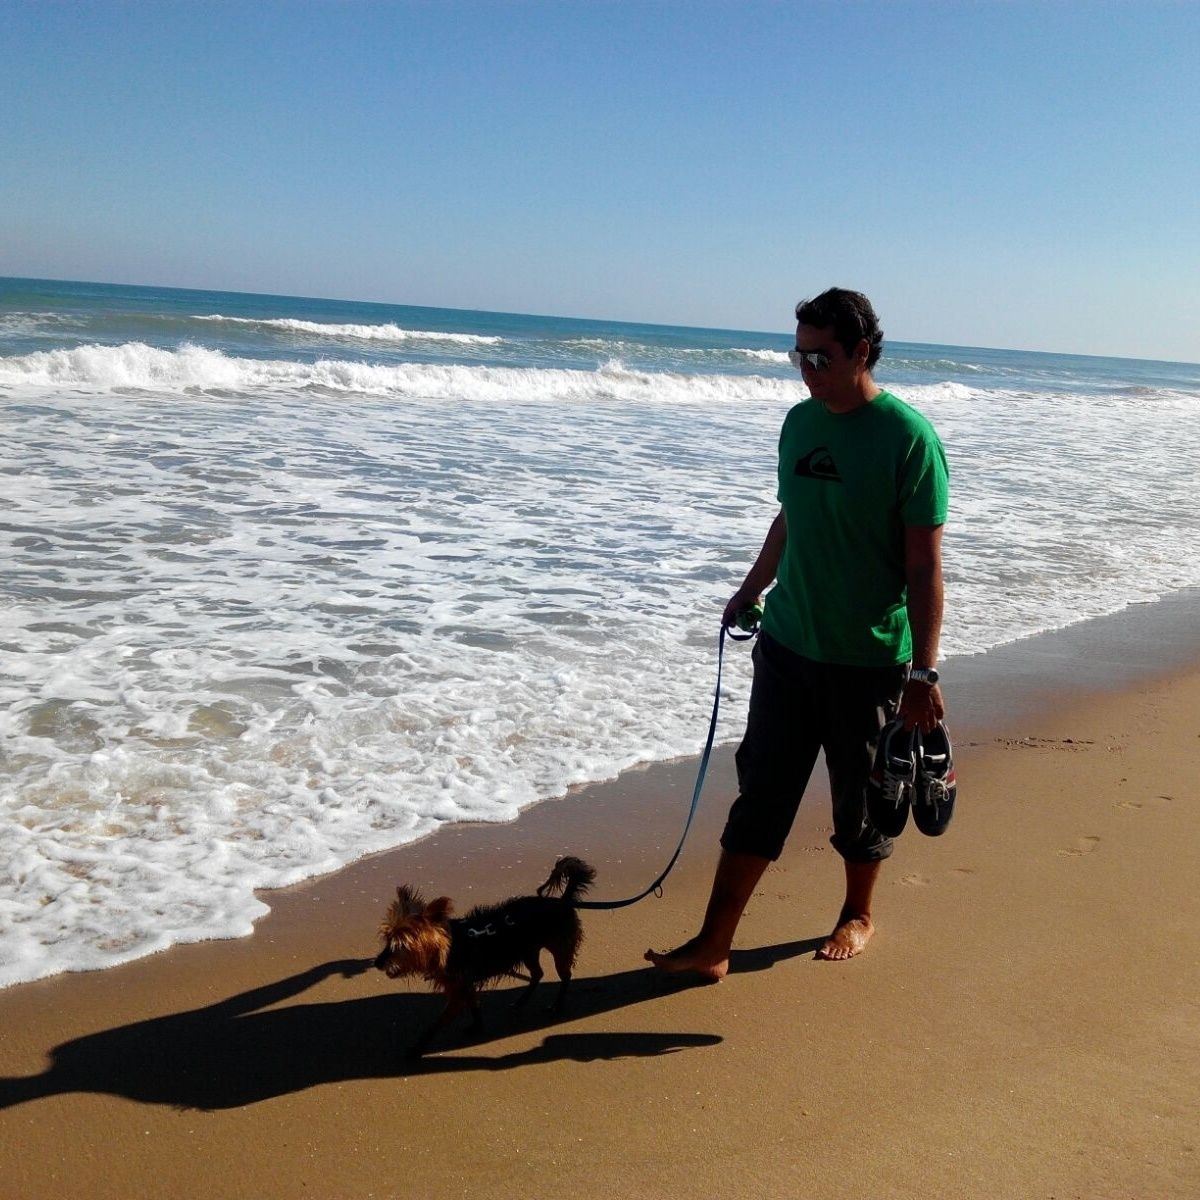 Curso No tirar de la correa y paseo agradable, CANILAND Escuela canina Valencia, educación canina